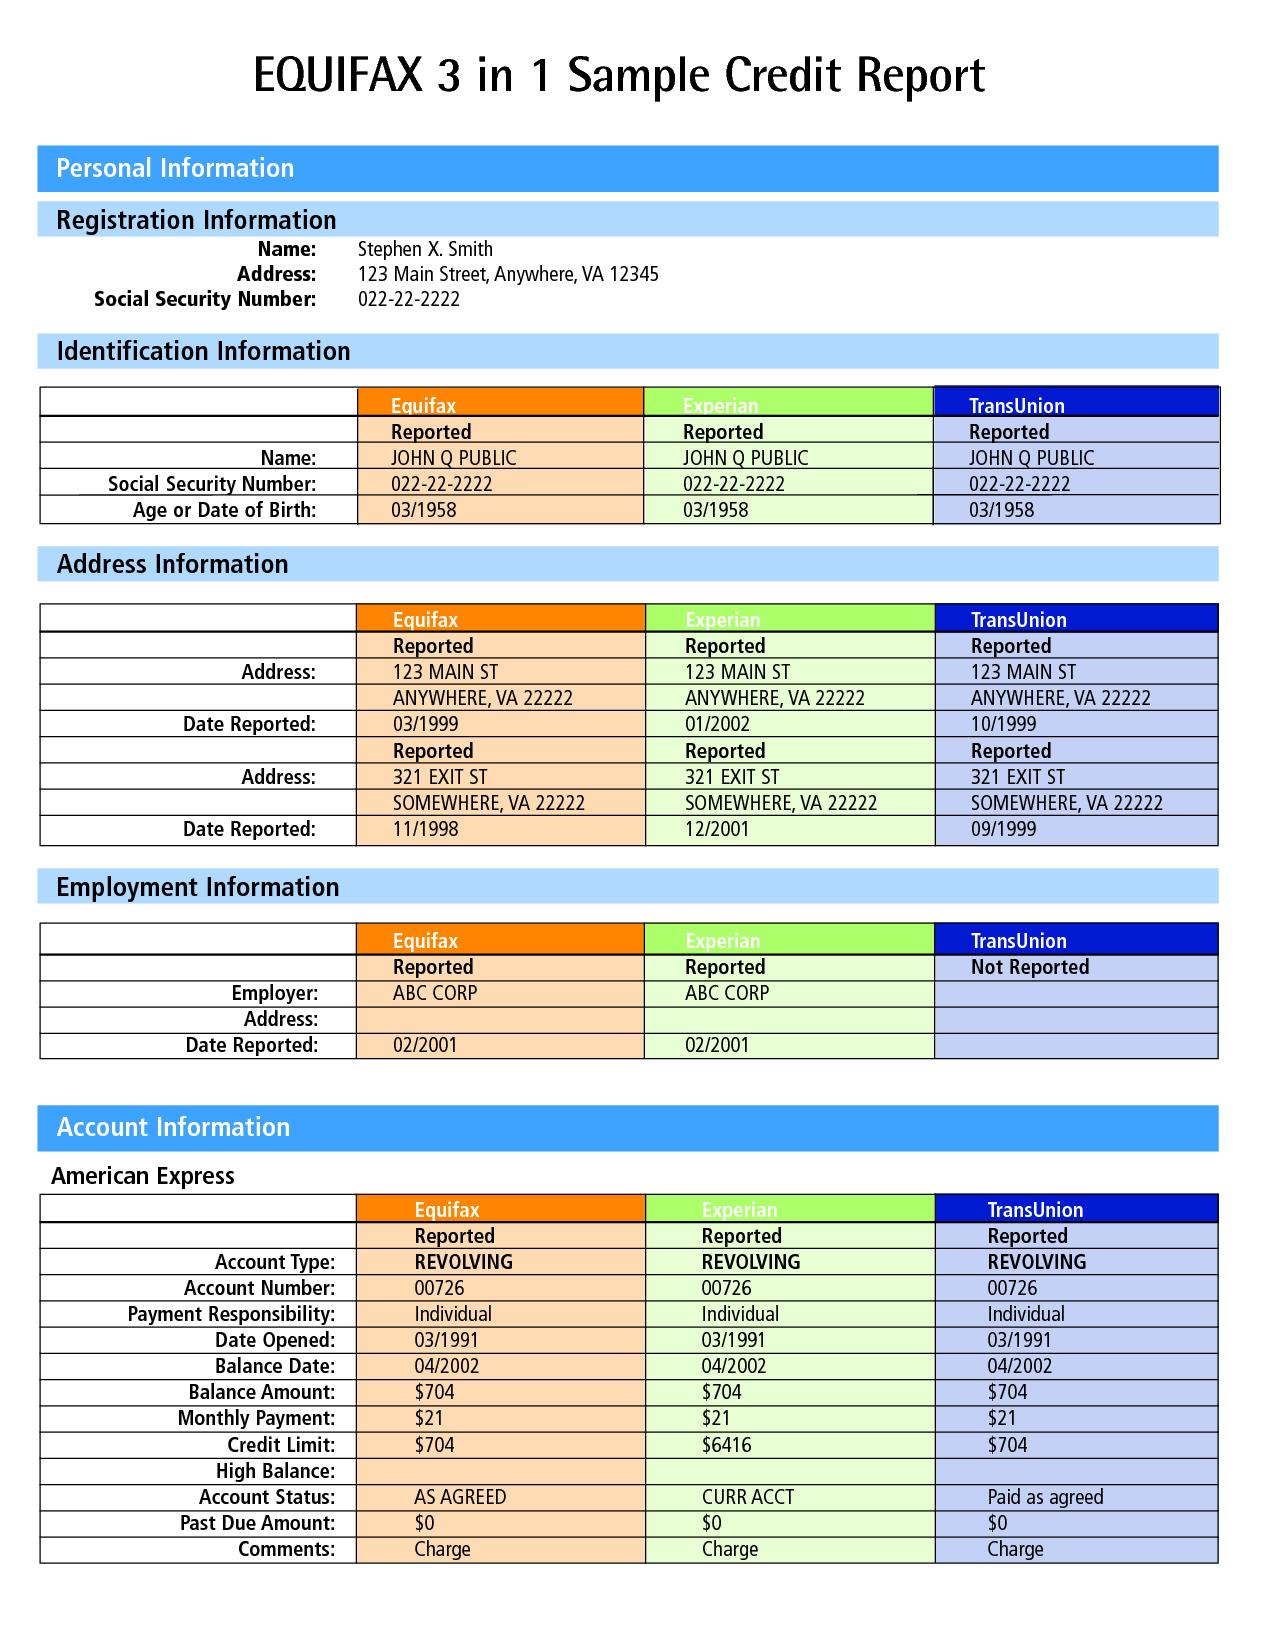 Experian Credit Report Dispute Forms